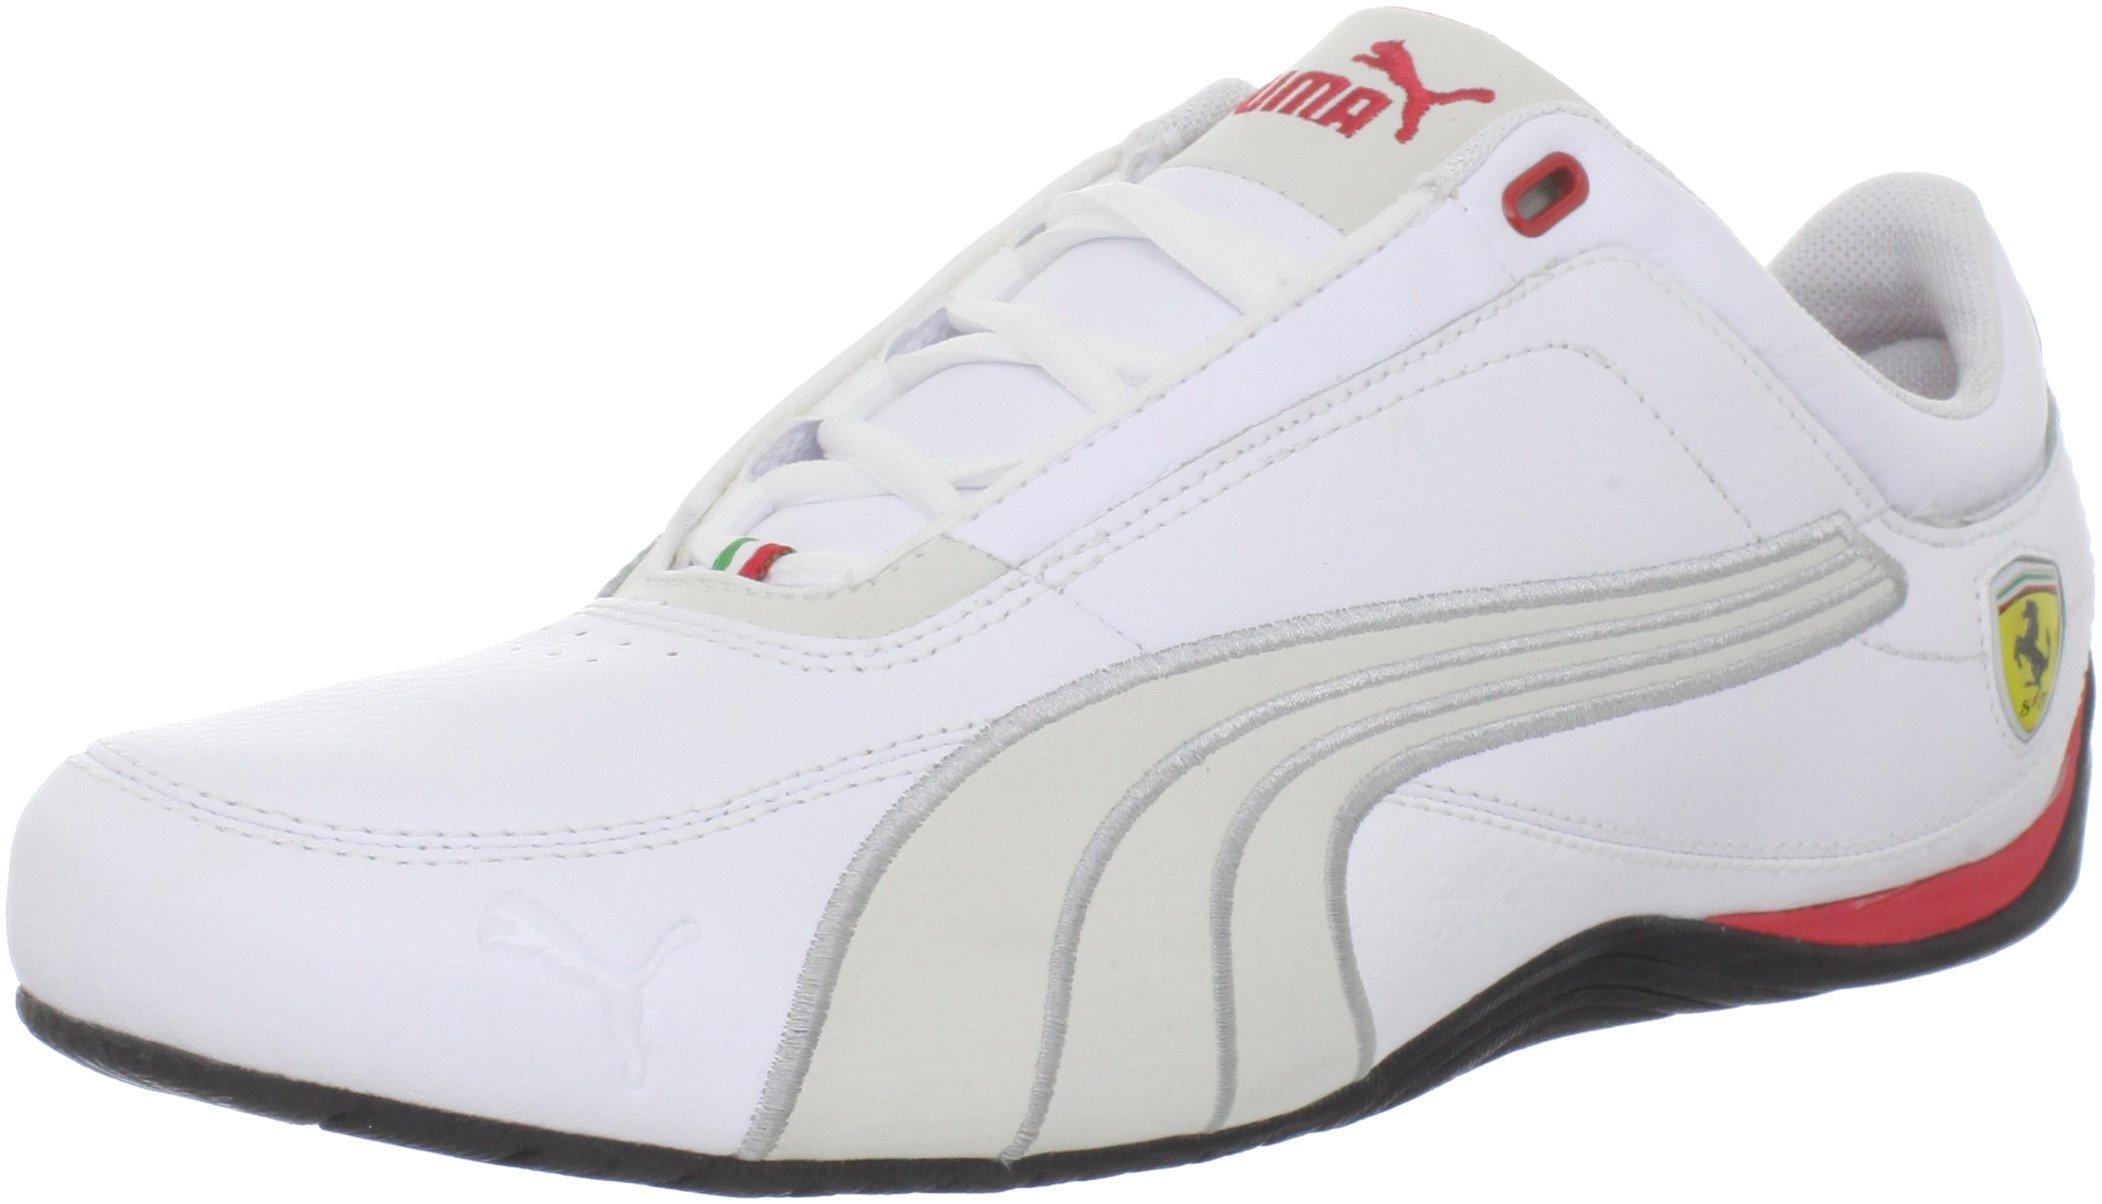 Puma Drift Cat 4 SF Carbon Fashion Sneaker,White/Rosso Corsa,13 D US